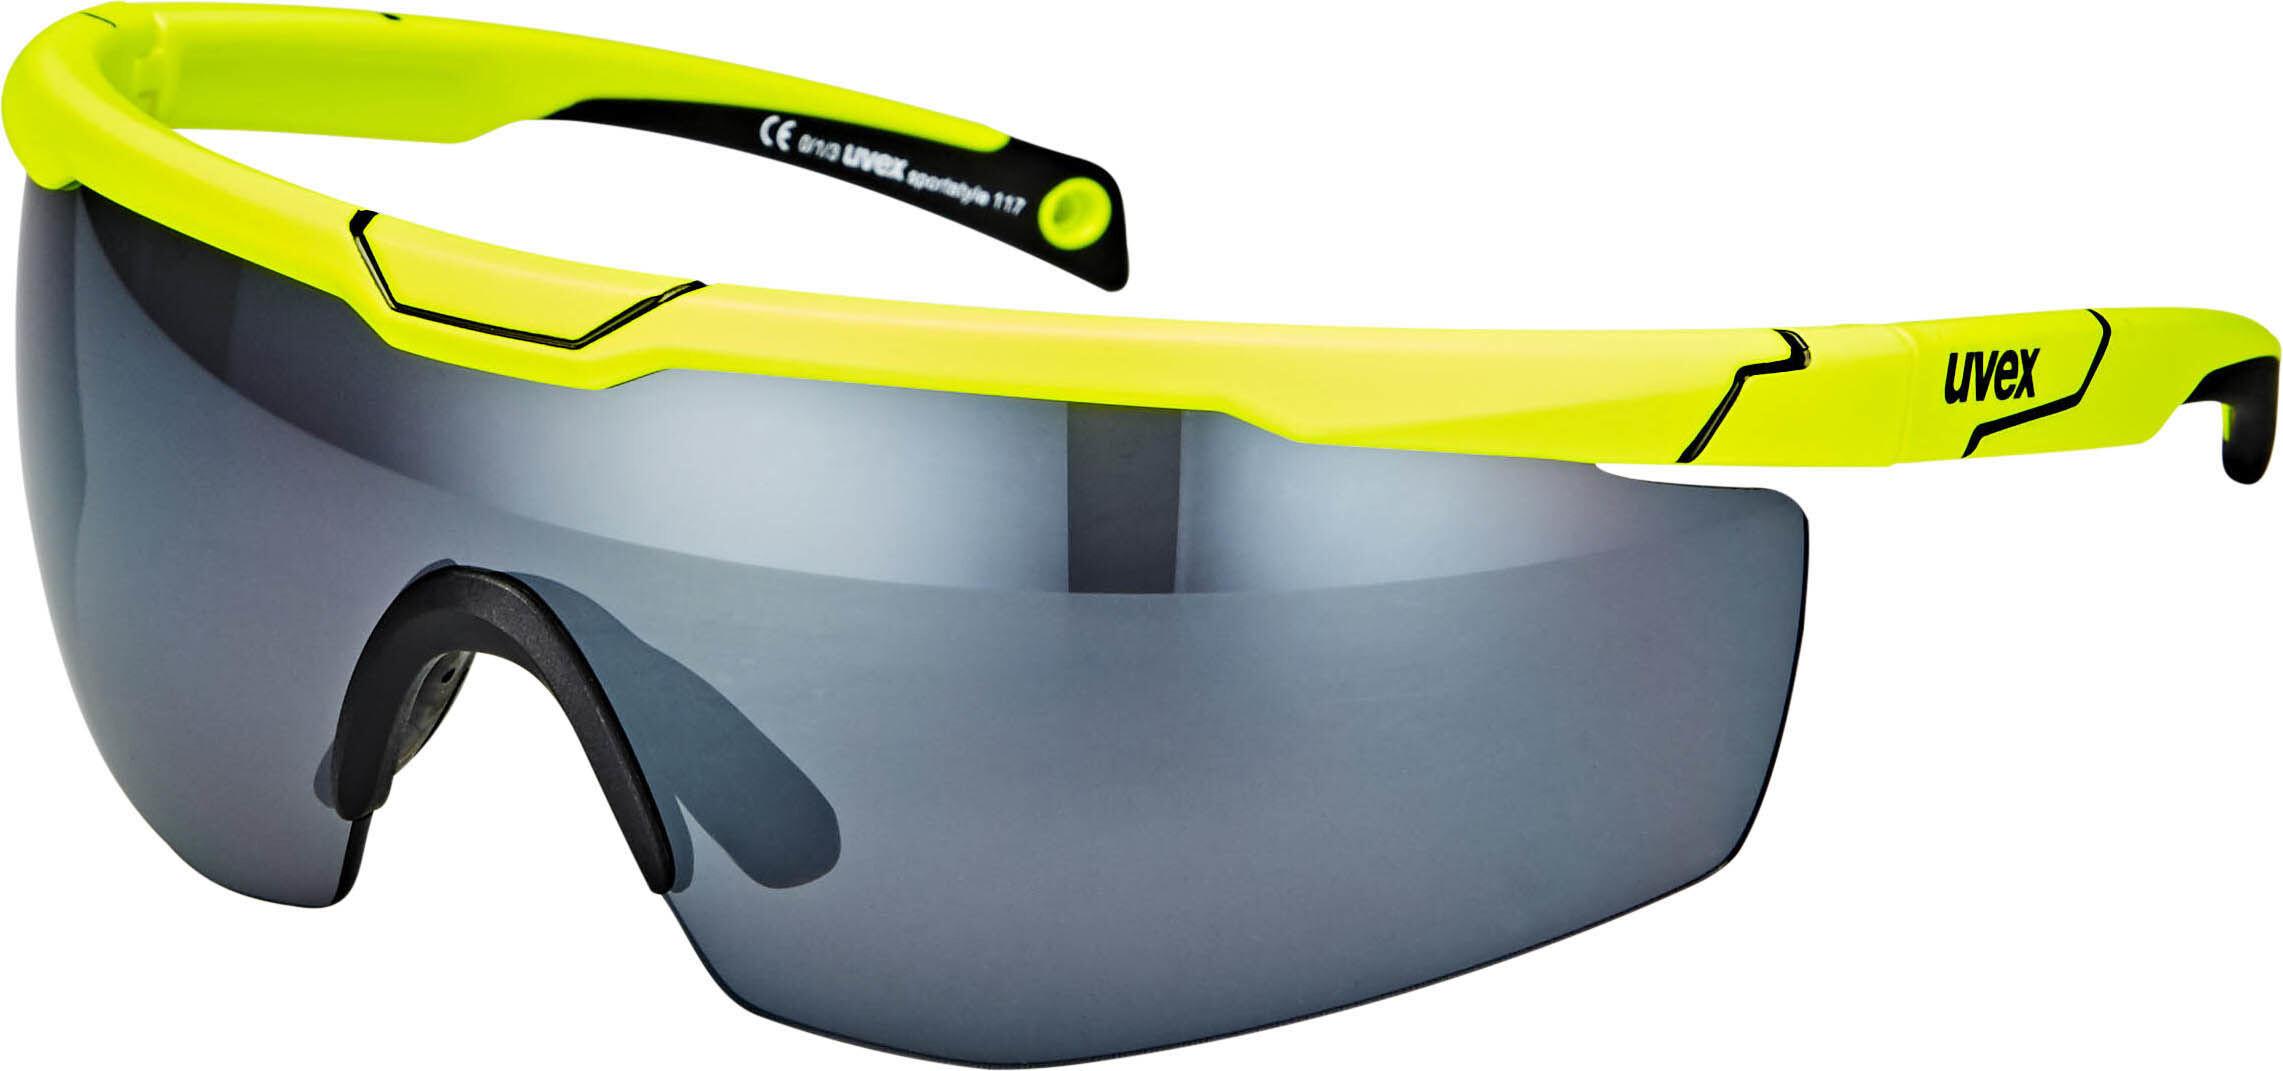 30aa8b723705 UVEX Sportstyle 117 Bike Glasses yellow at Bikester.co.uk